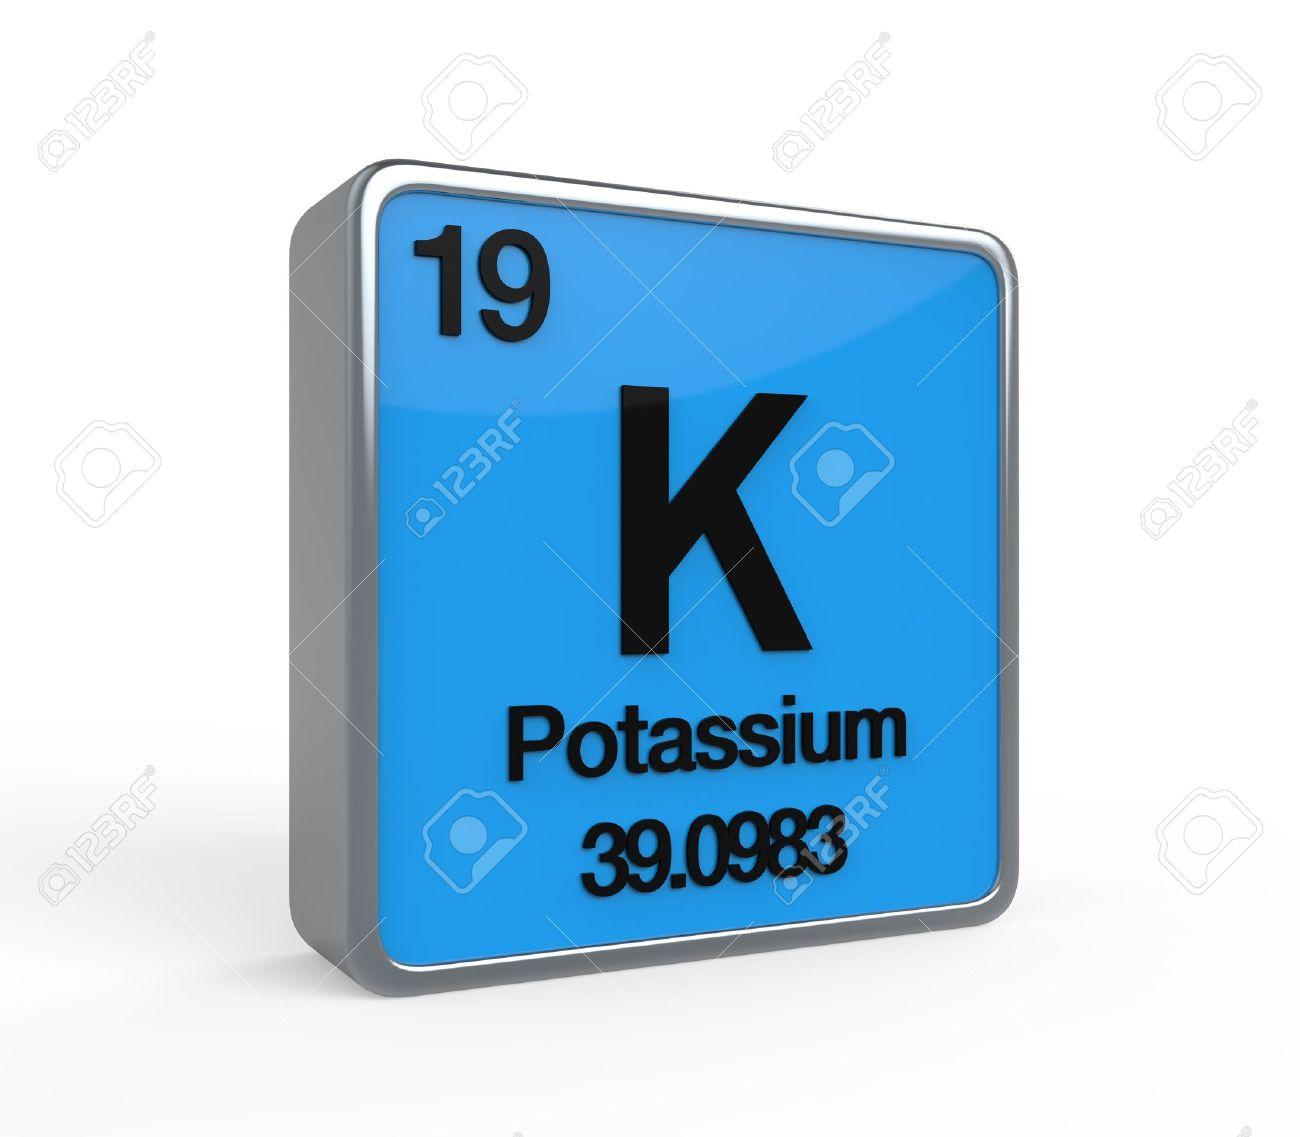 Potassium element periodic table stock photo picture and royalty potassium element periodic table stock photo 21700923 urtaz Gallery